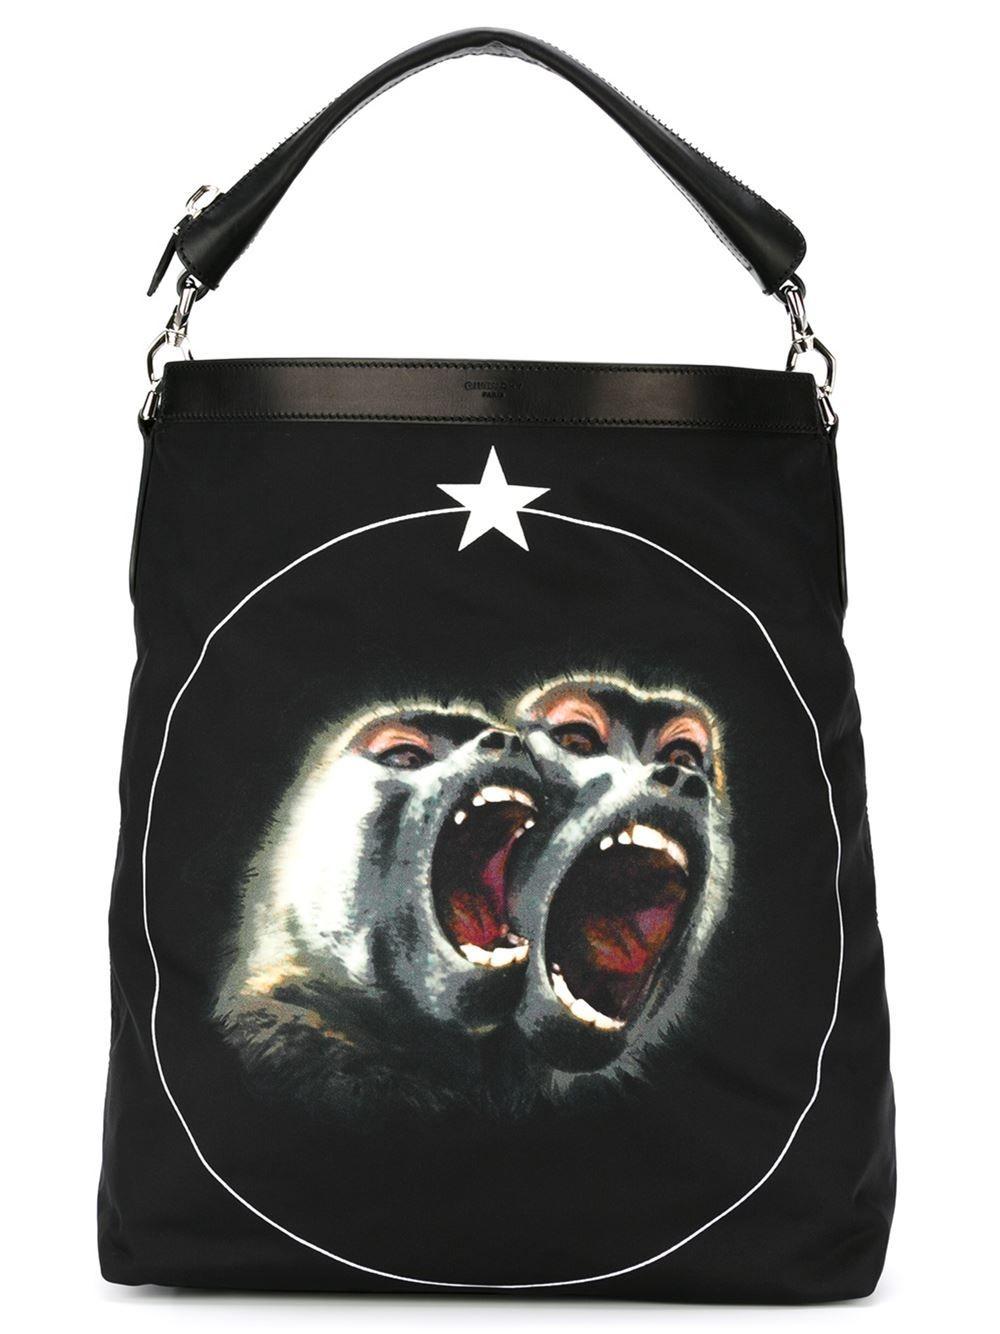 b61bdade357b Givenchy Monkey Brothers shoulder bag 1590 EUR    2190. 38x44x15 cm. 15 Jan  2017 on sale at Lidaishopping was 1303.28 EUR